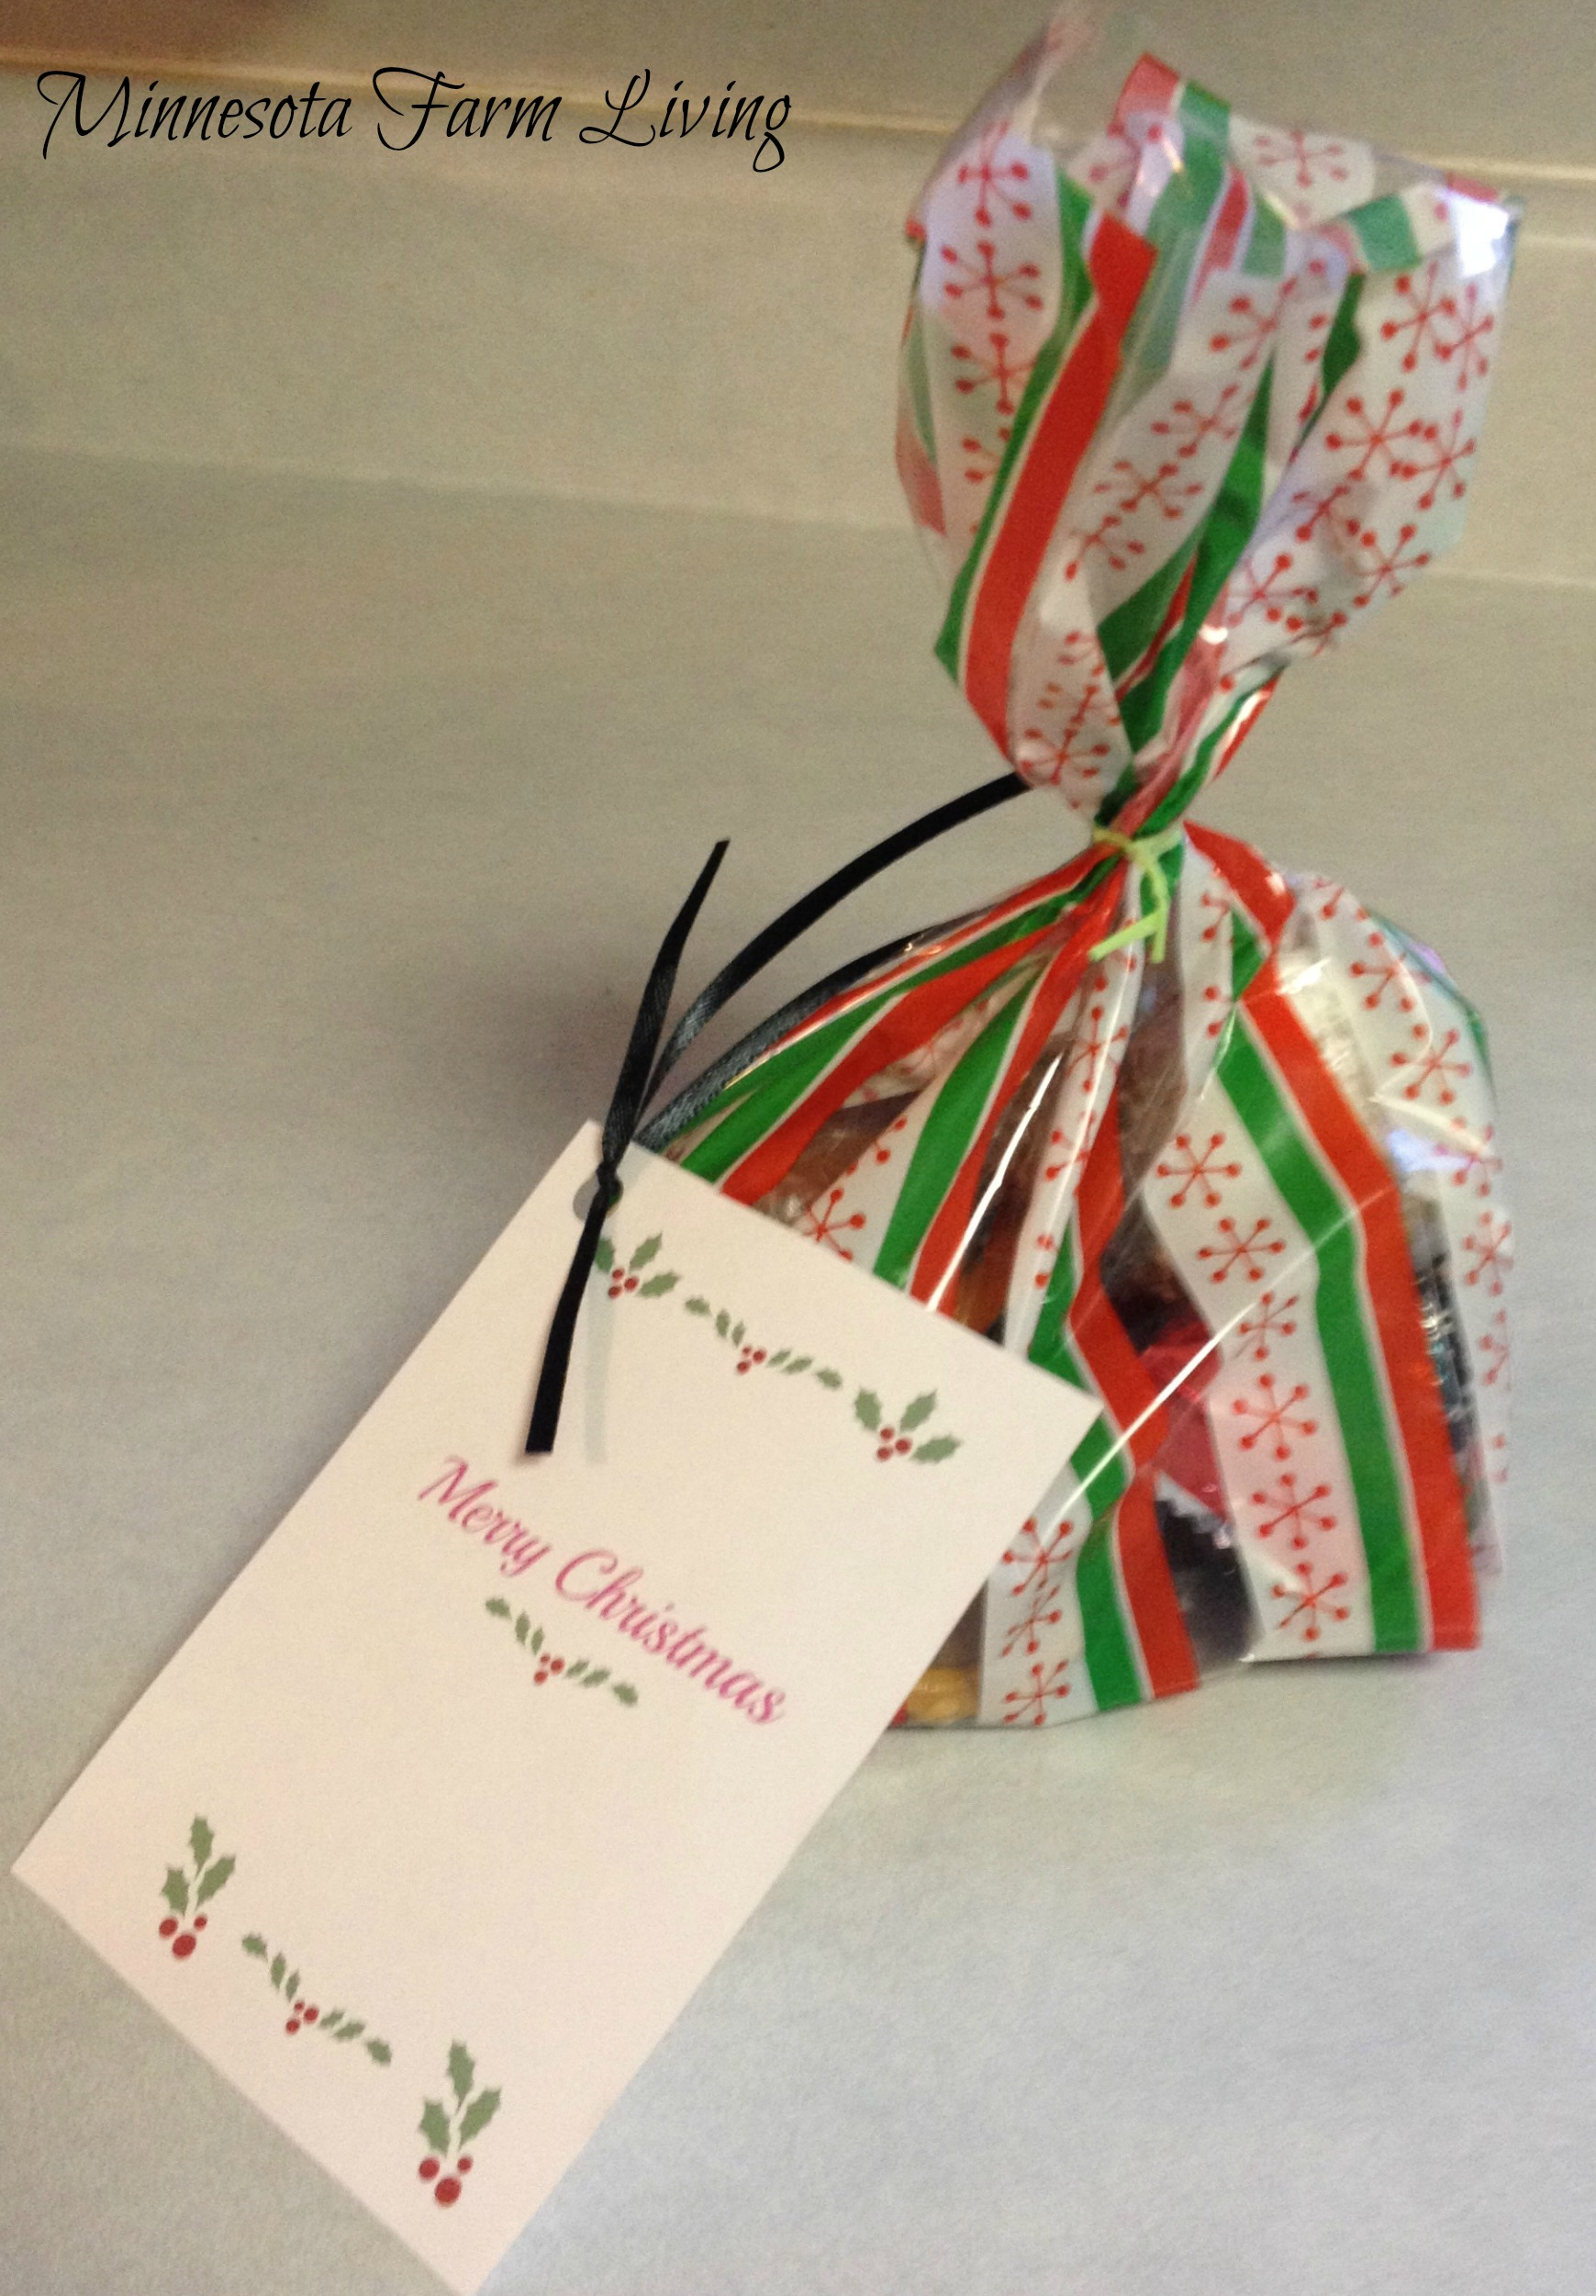 Day 17 – Random Act of Christmas Kindness – Senior Citizens